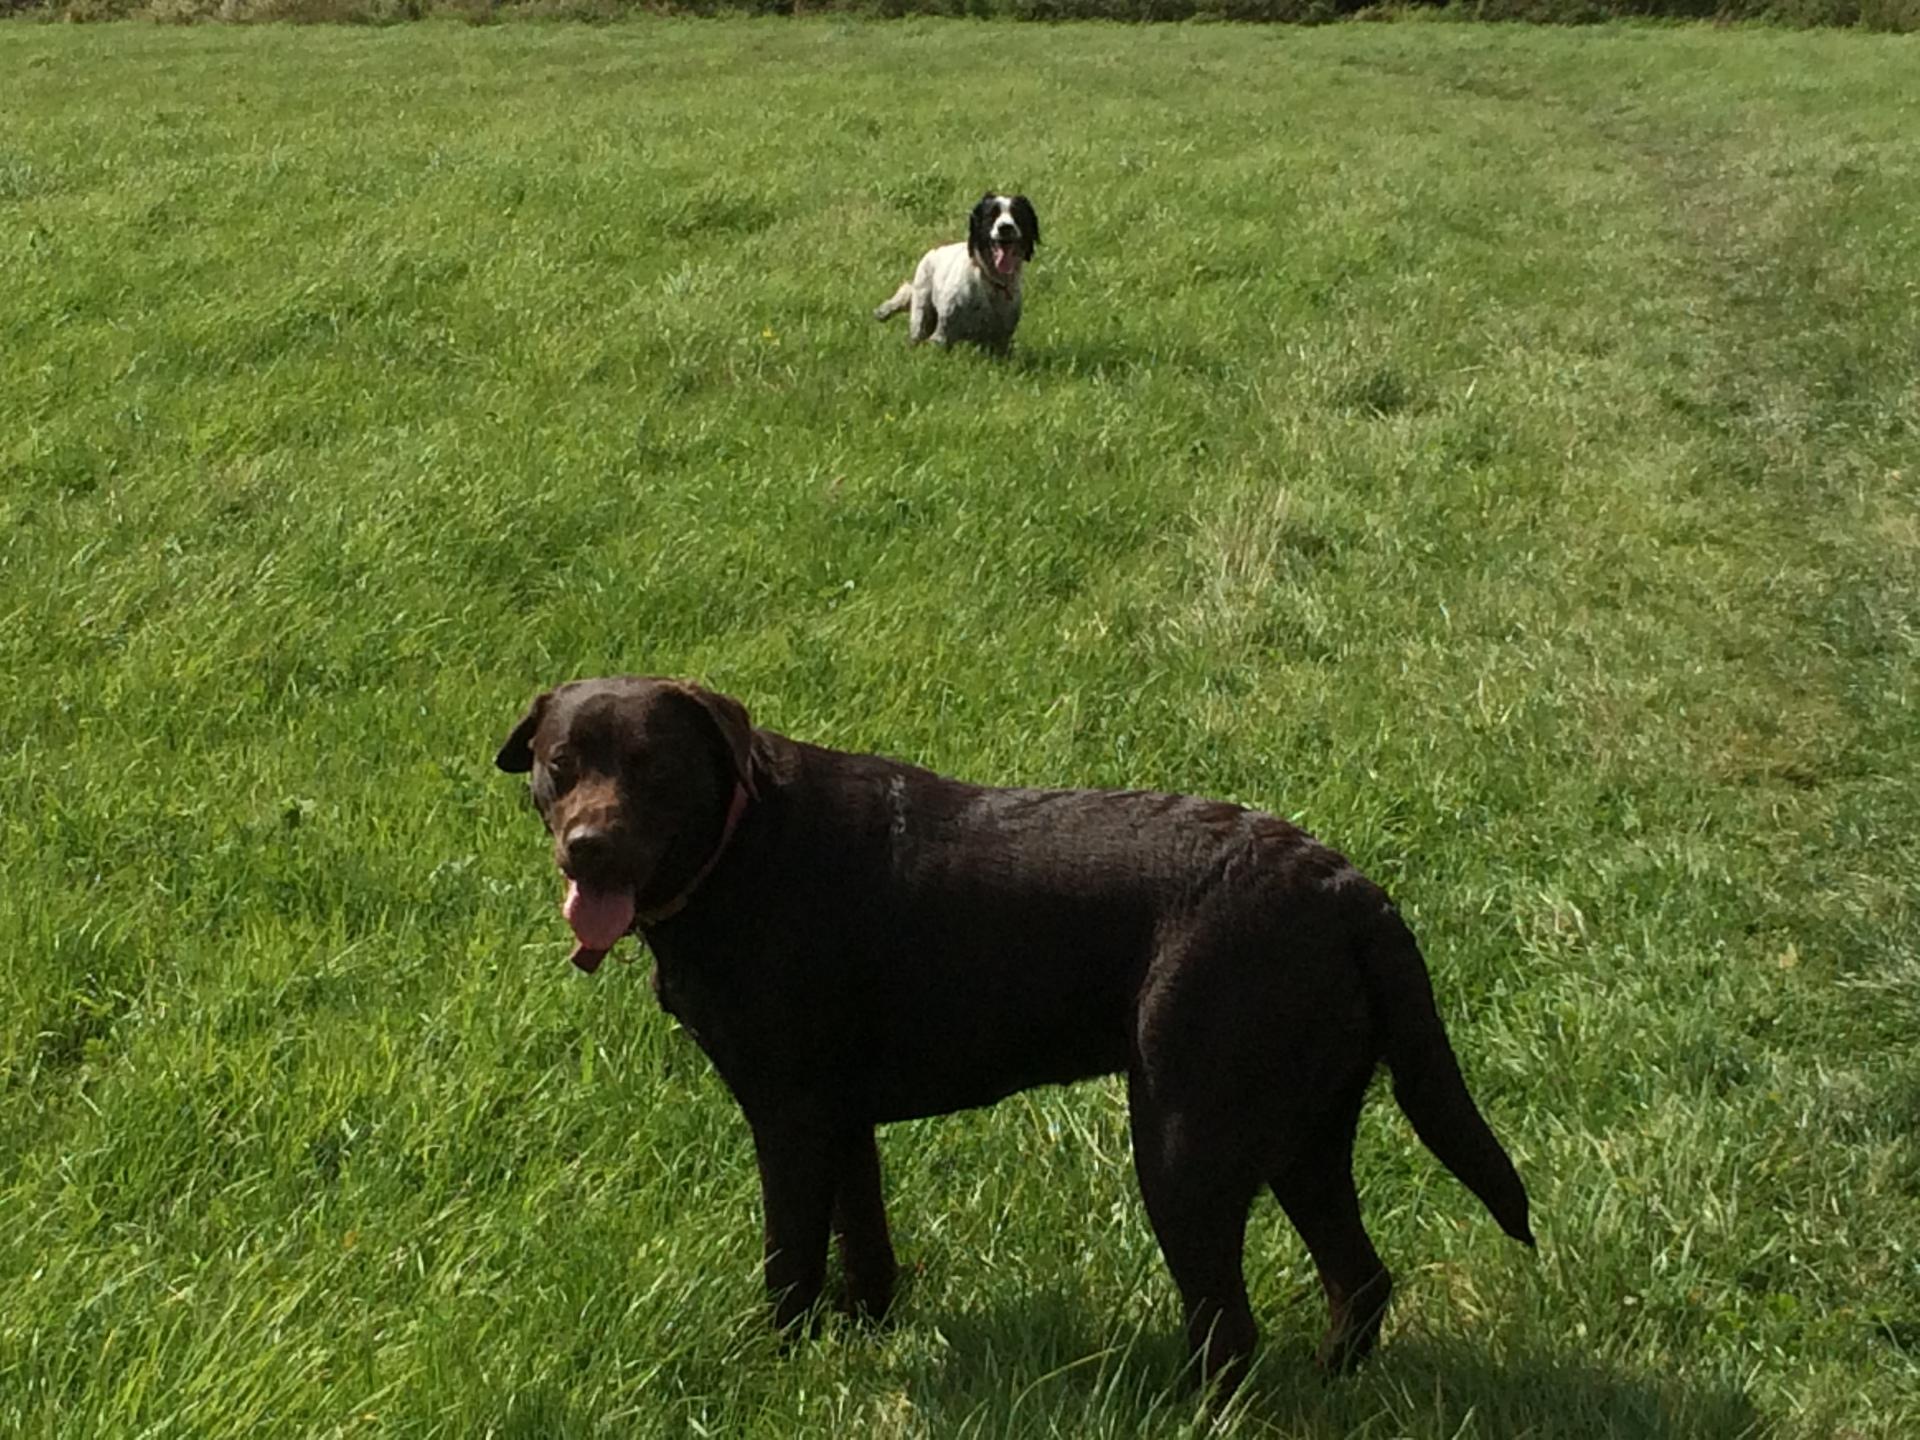 Chocolate Labrador on walk